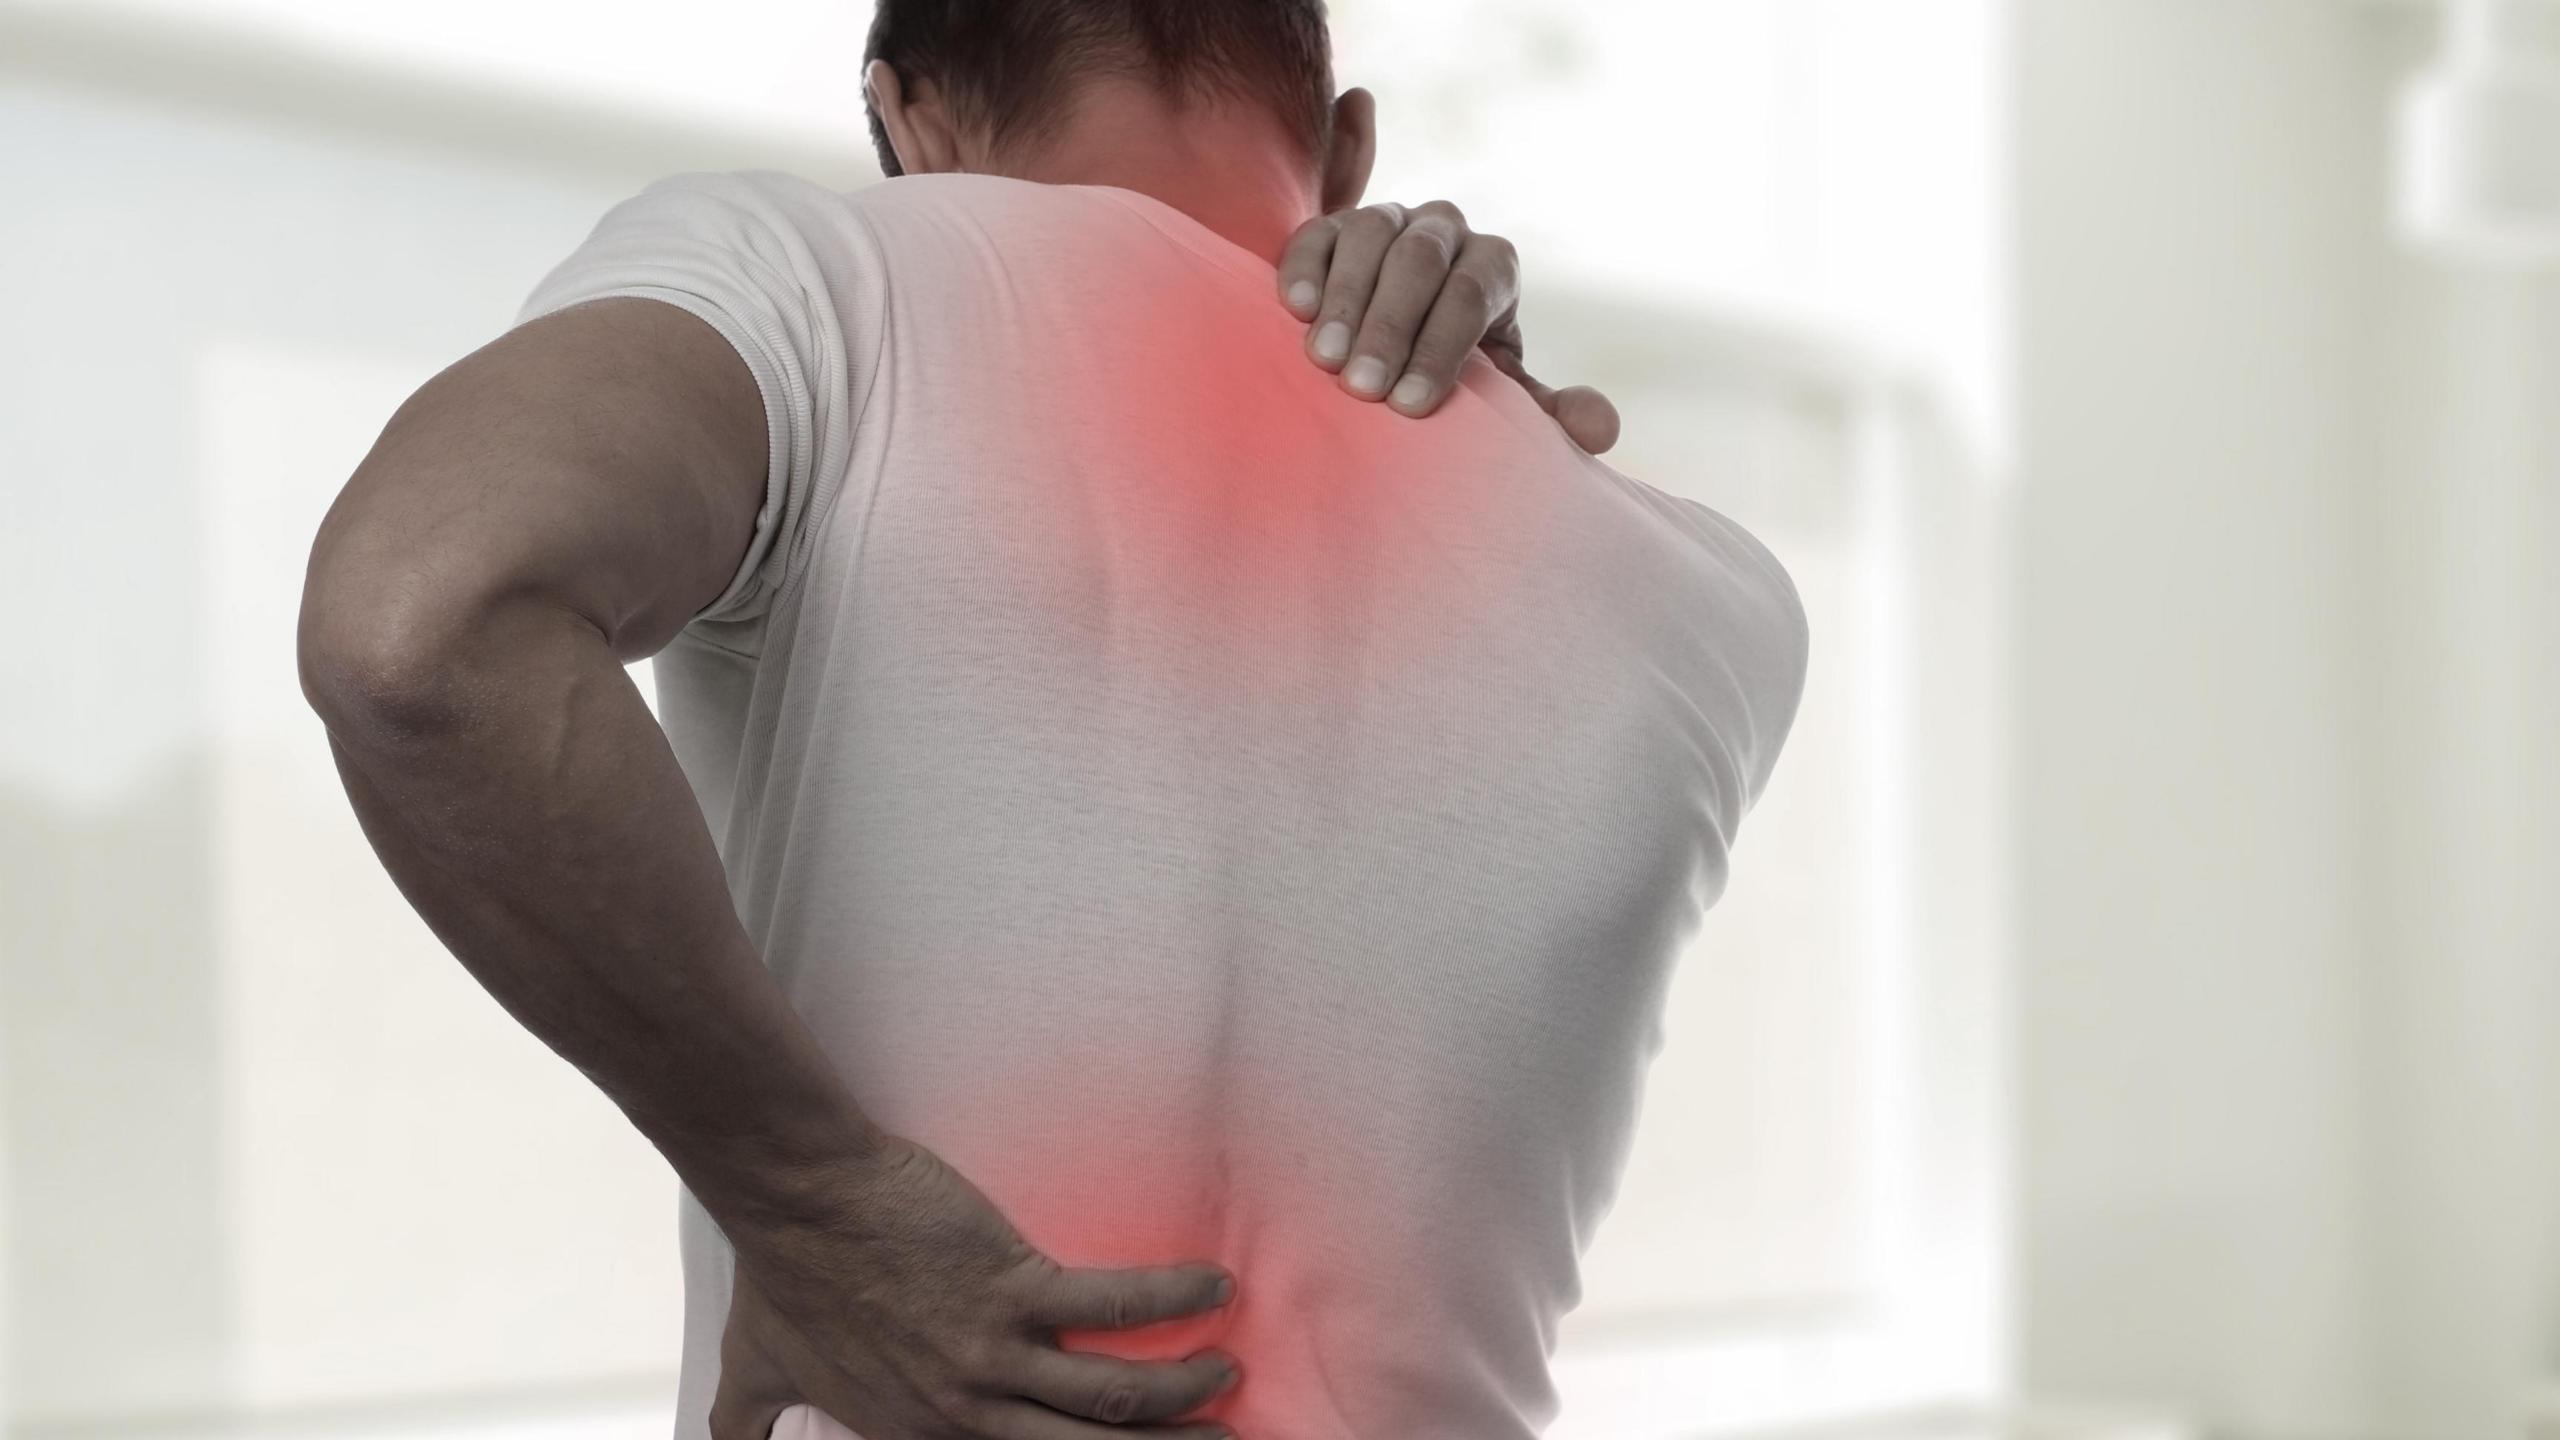 Newsweek AMPLIFY - CBD for Body Pain